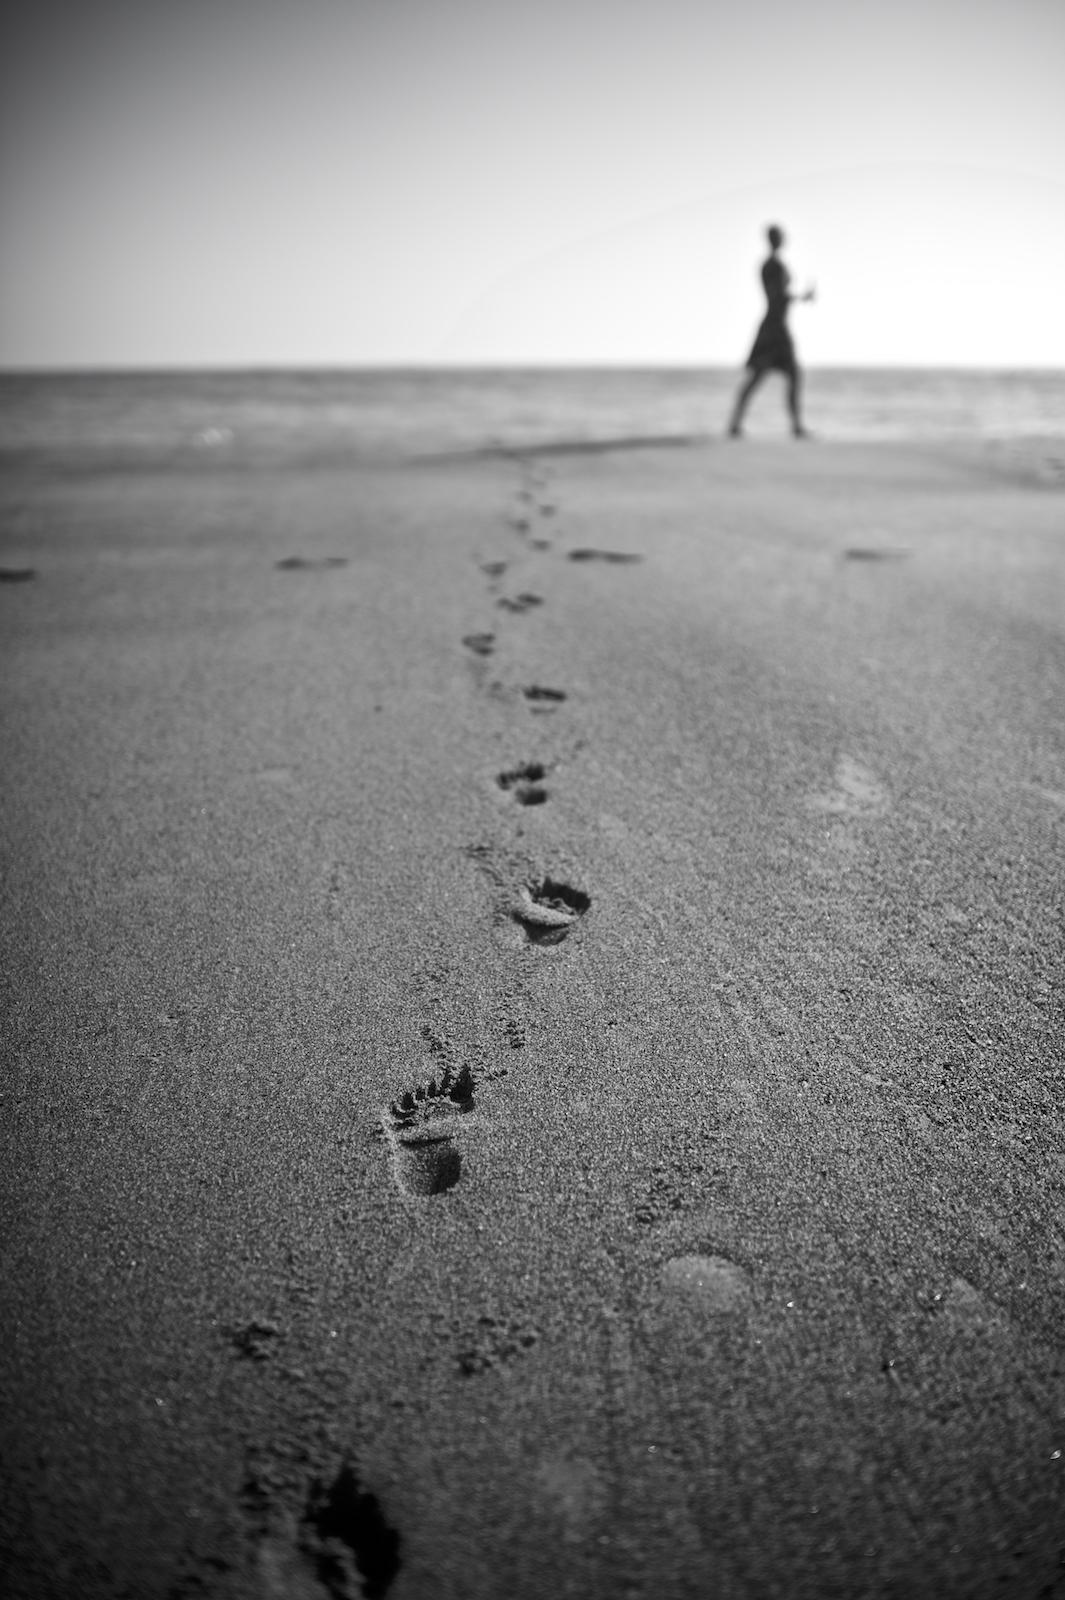 A woman on Navarro Beach in California. Image by New Orleans based travel photographer, Marc Pagani - marcpagani.com